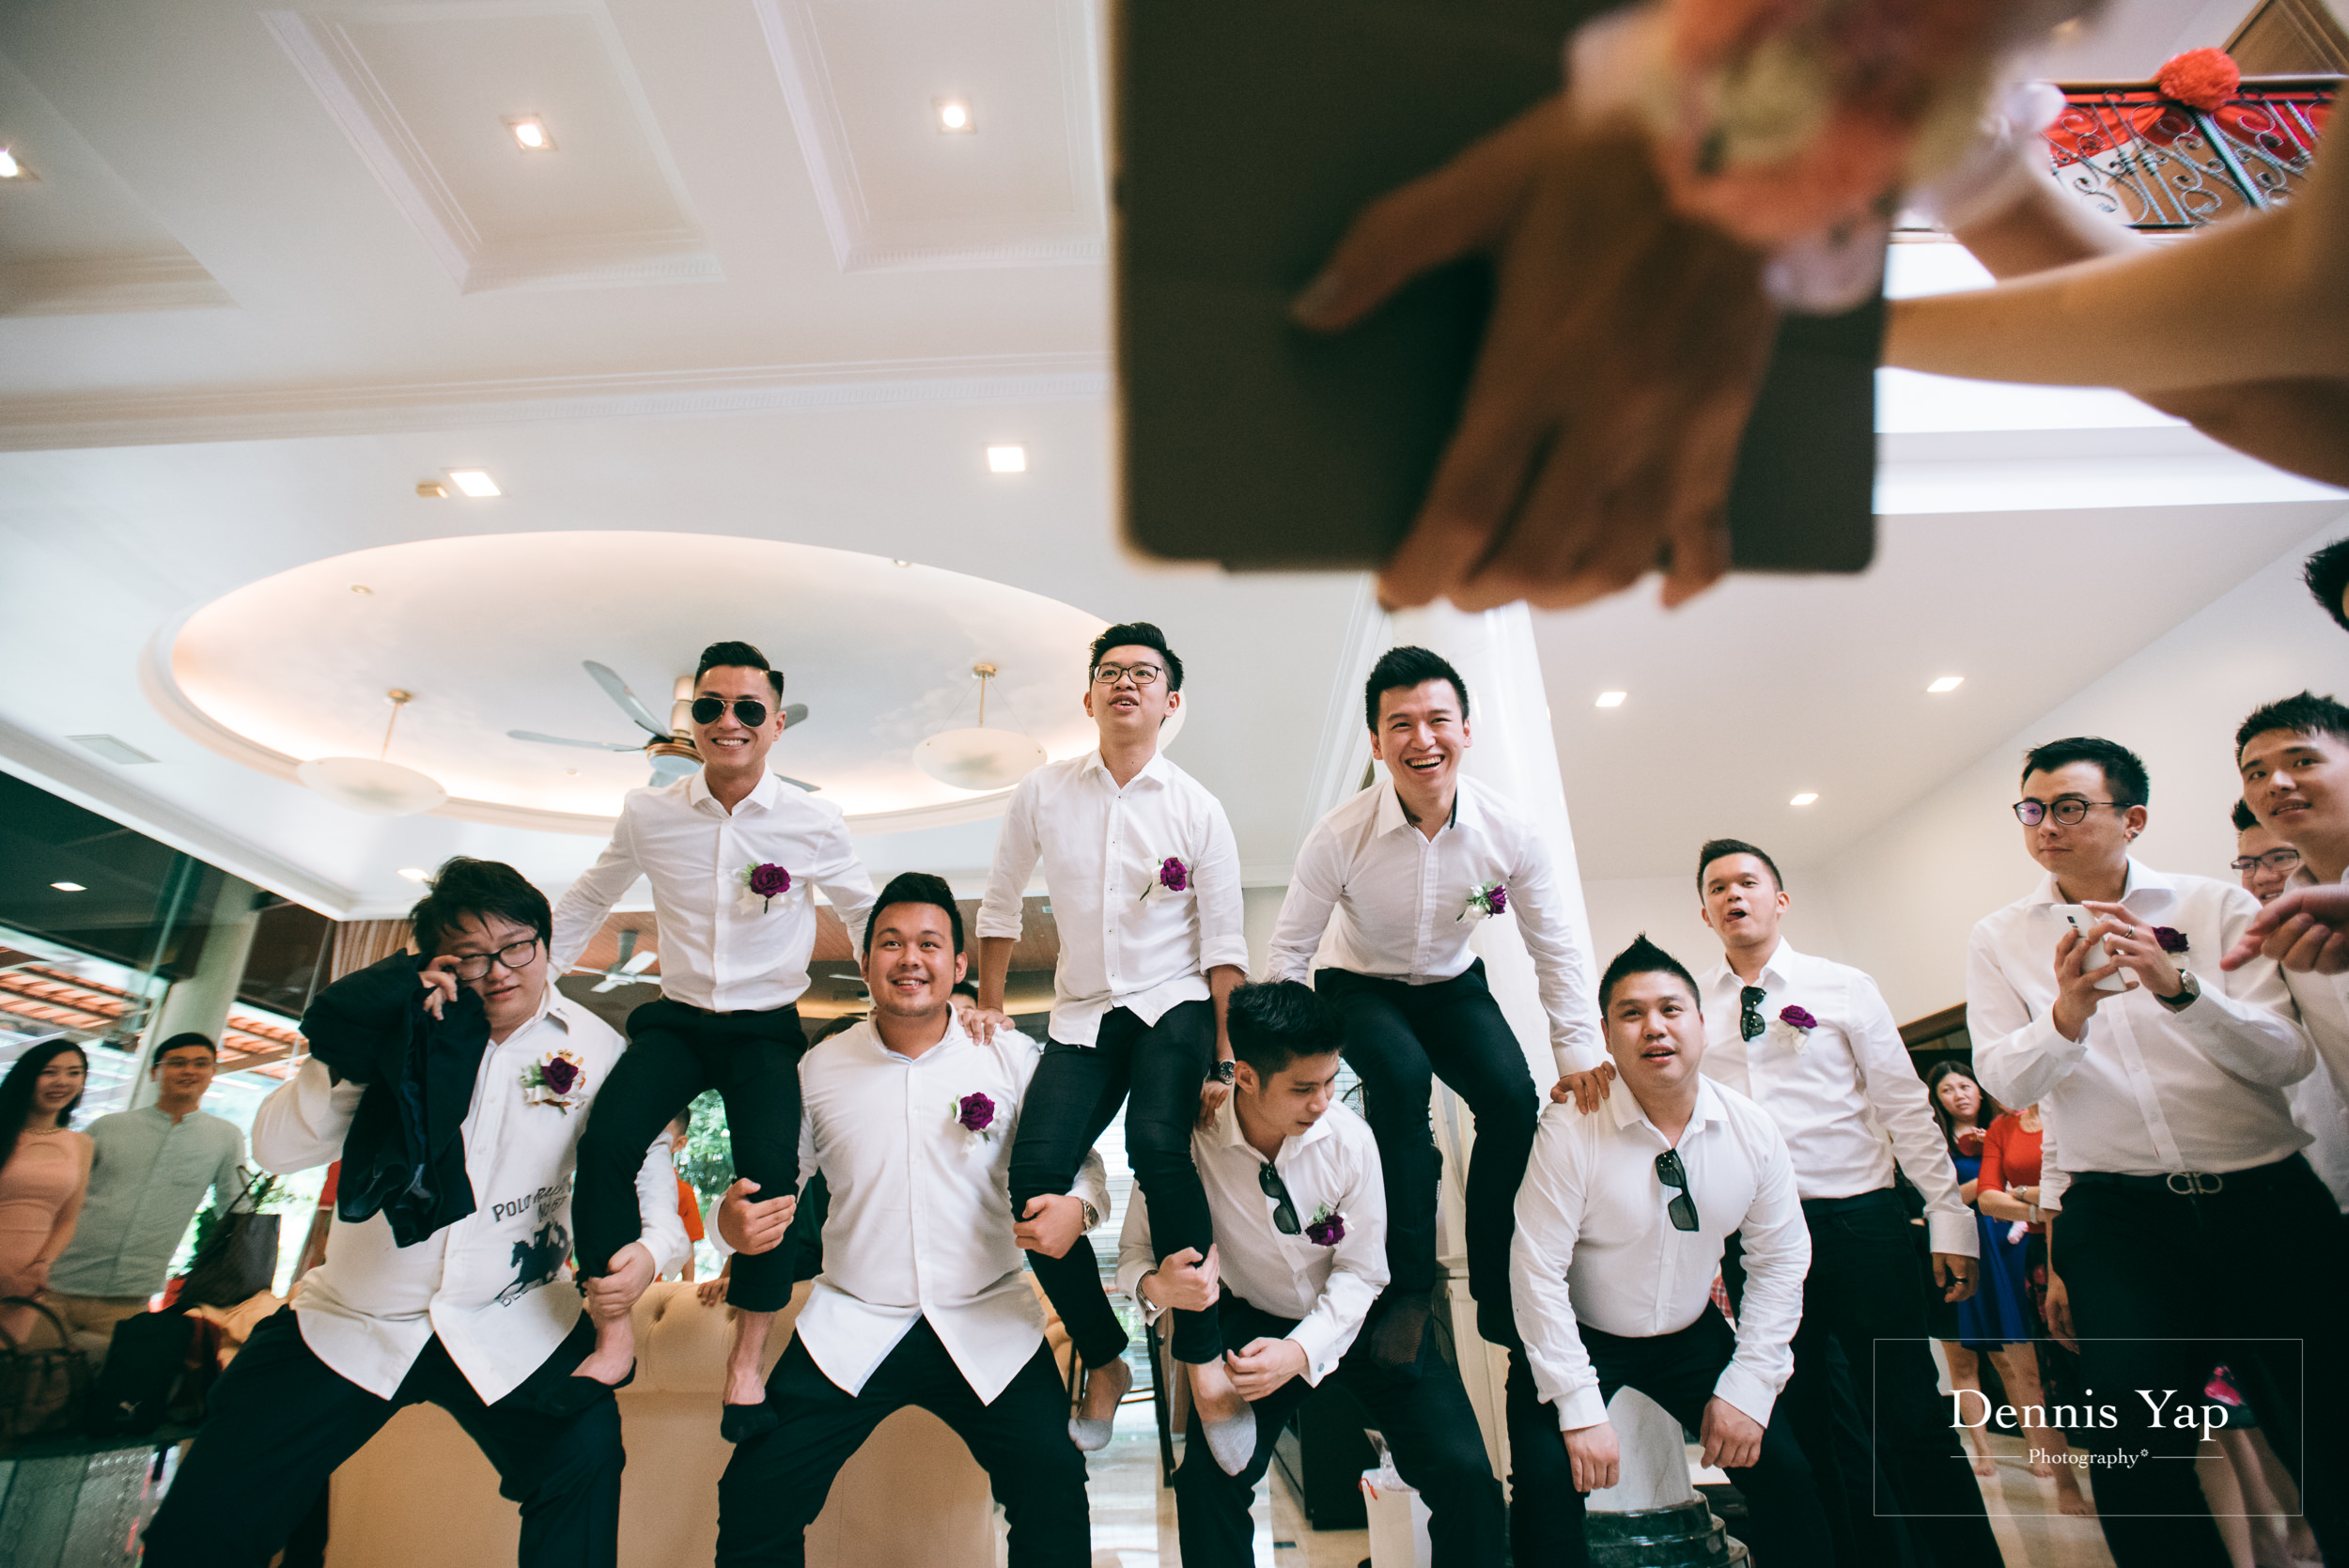 ivan constance wedding day renaissance hotel dennis yap photography-19.jpg